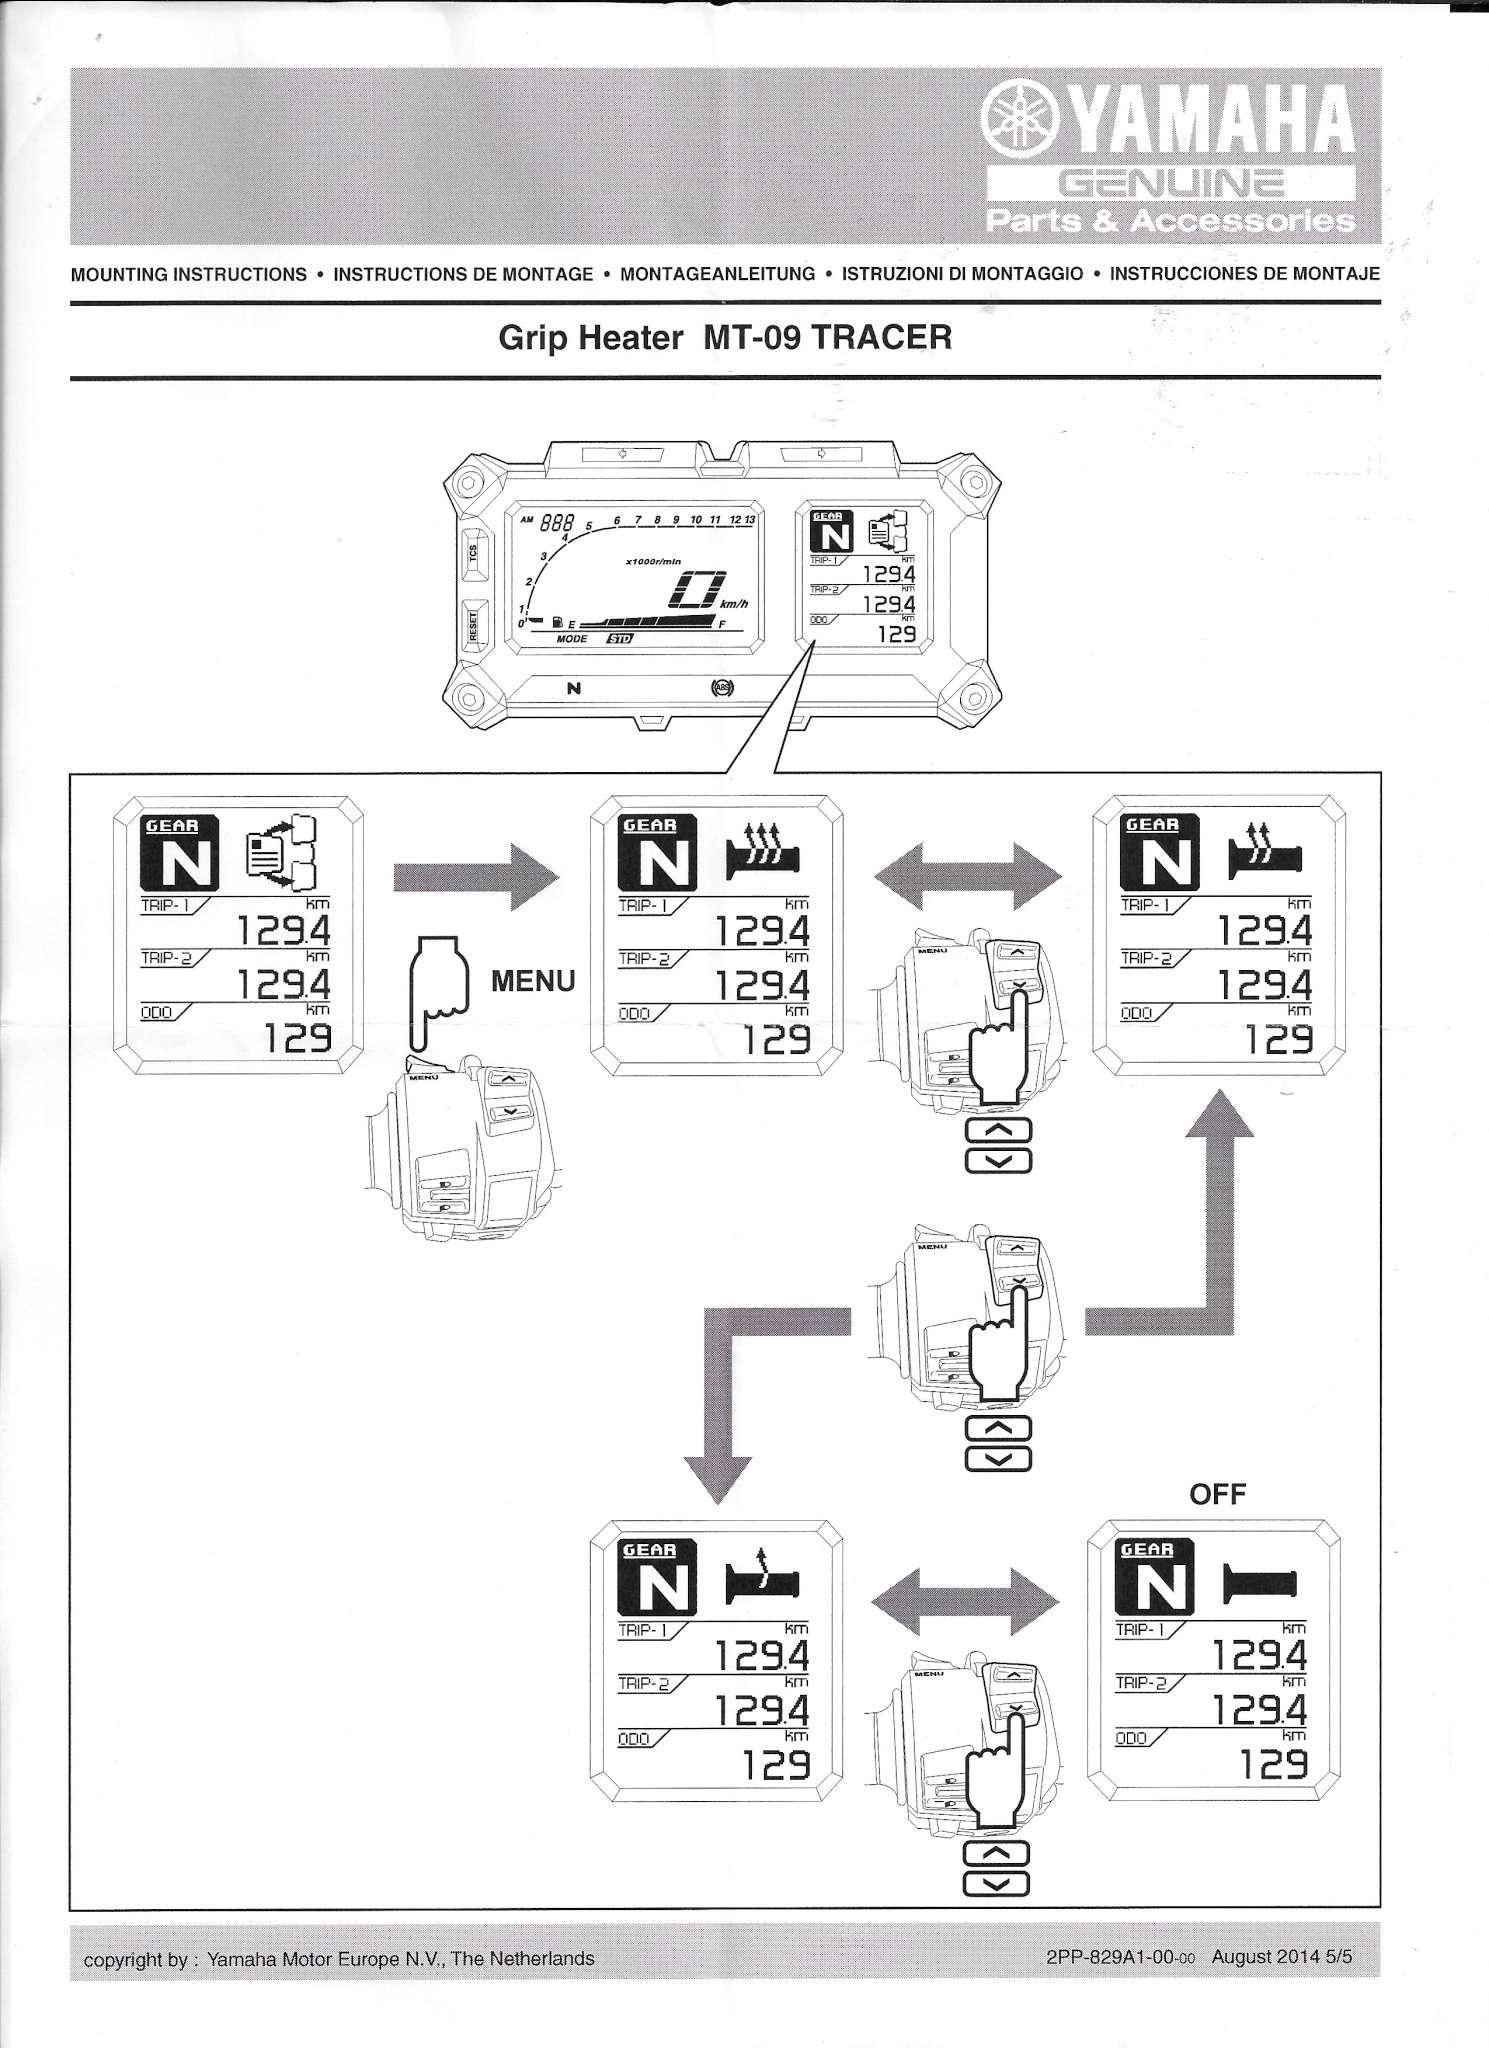 Poignées chauffantes Yamaha Tracer - Page 3 Yamaha14